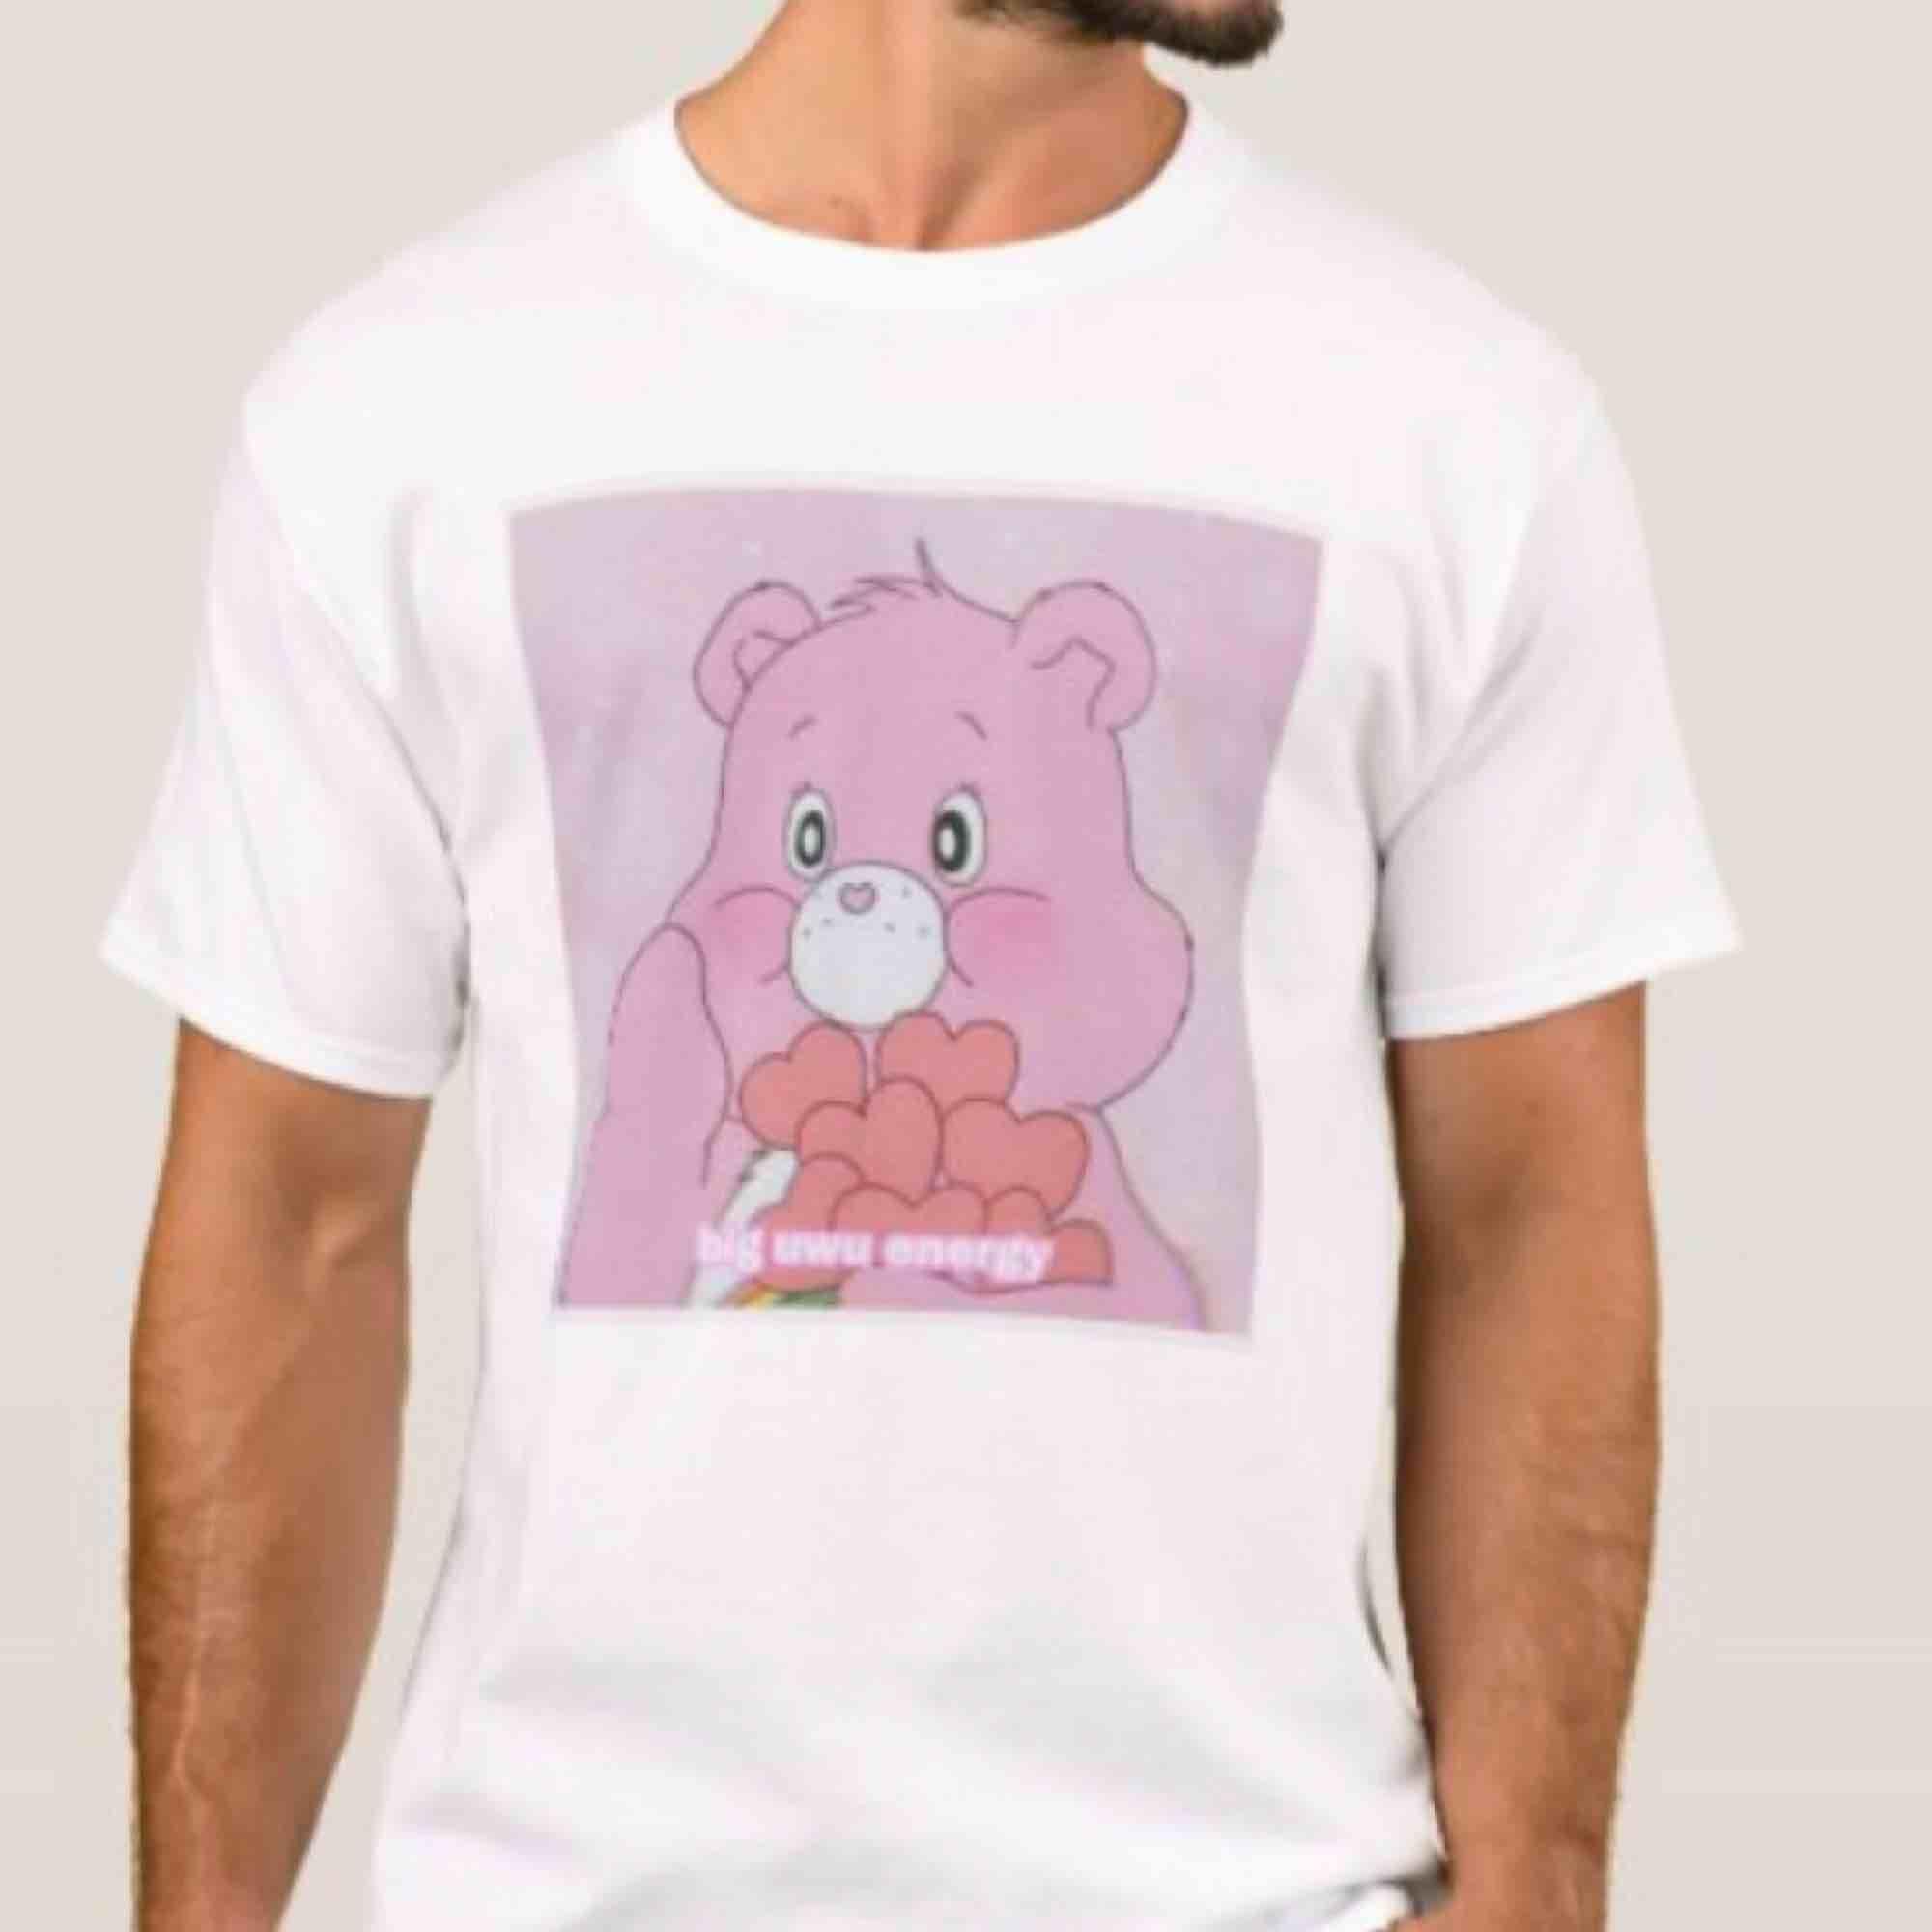 Egendesignad tröja från min carebear kollektion!  Mer om frakt i min profil. T-shirts.